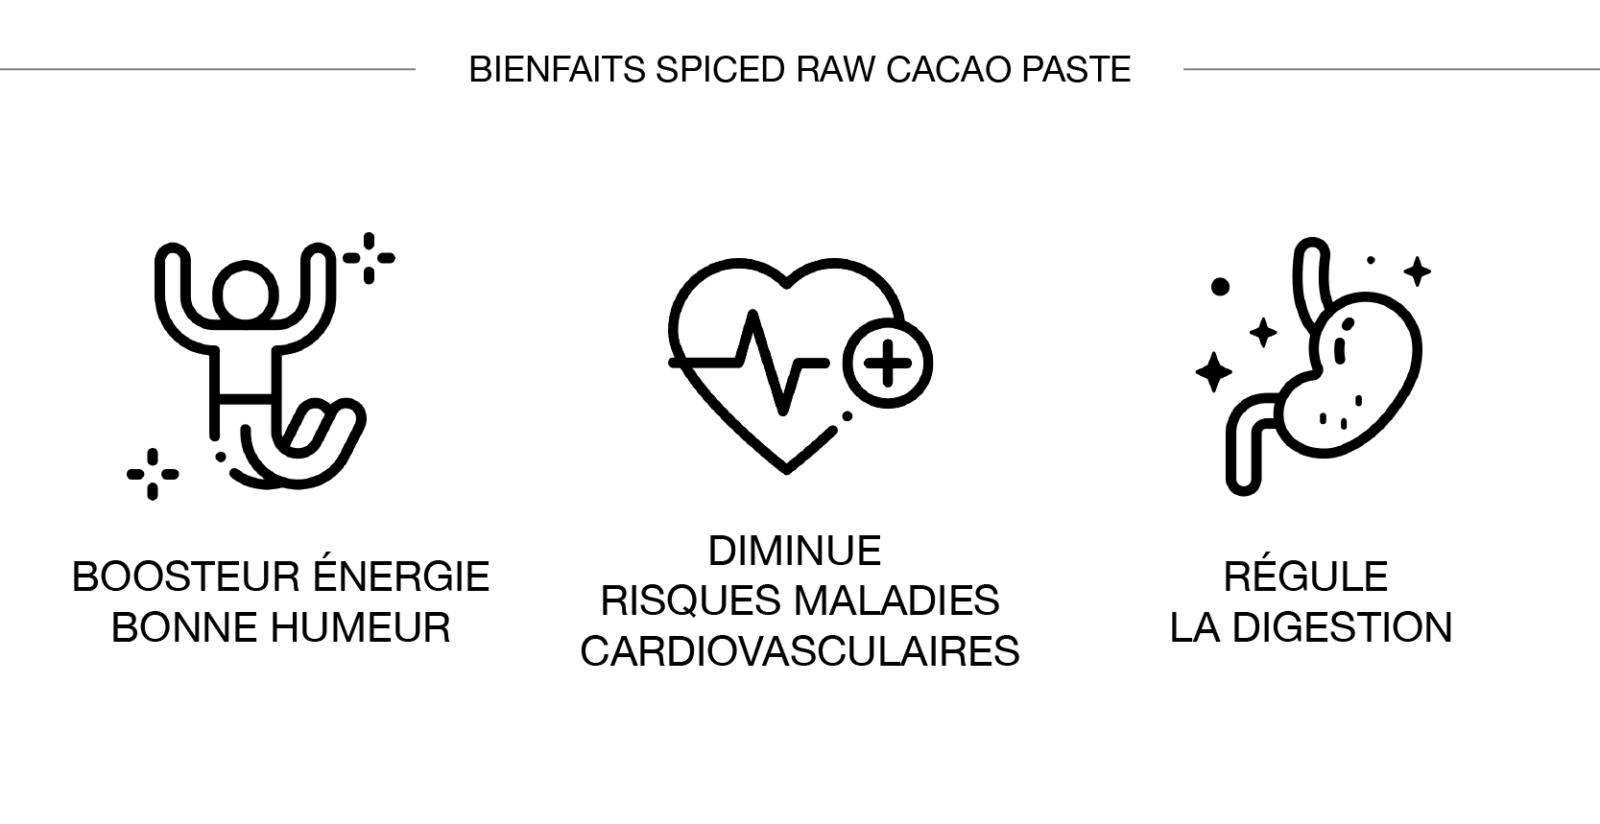 Spiced Raw Cacao bienfaits